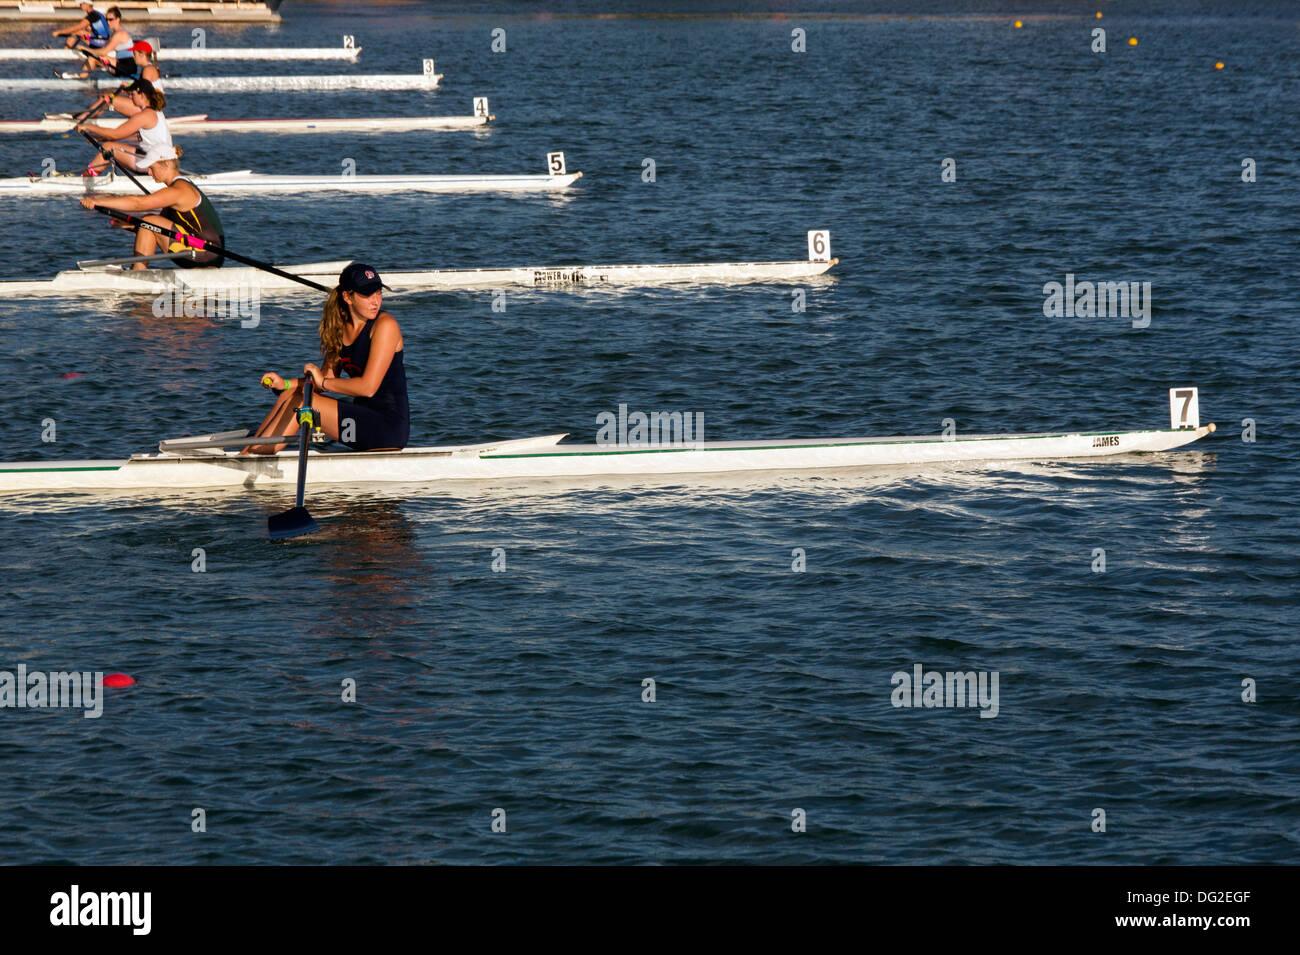 single women's rowing regatta start of the race - Stock Image